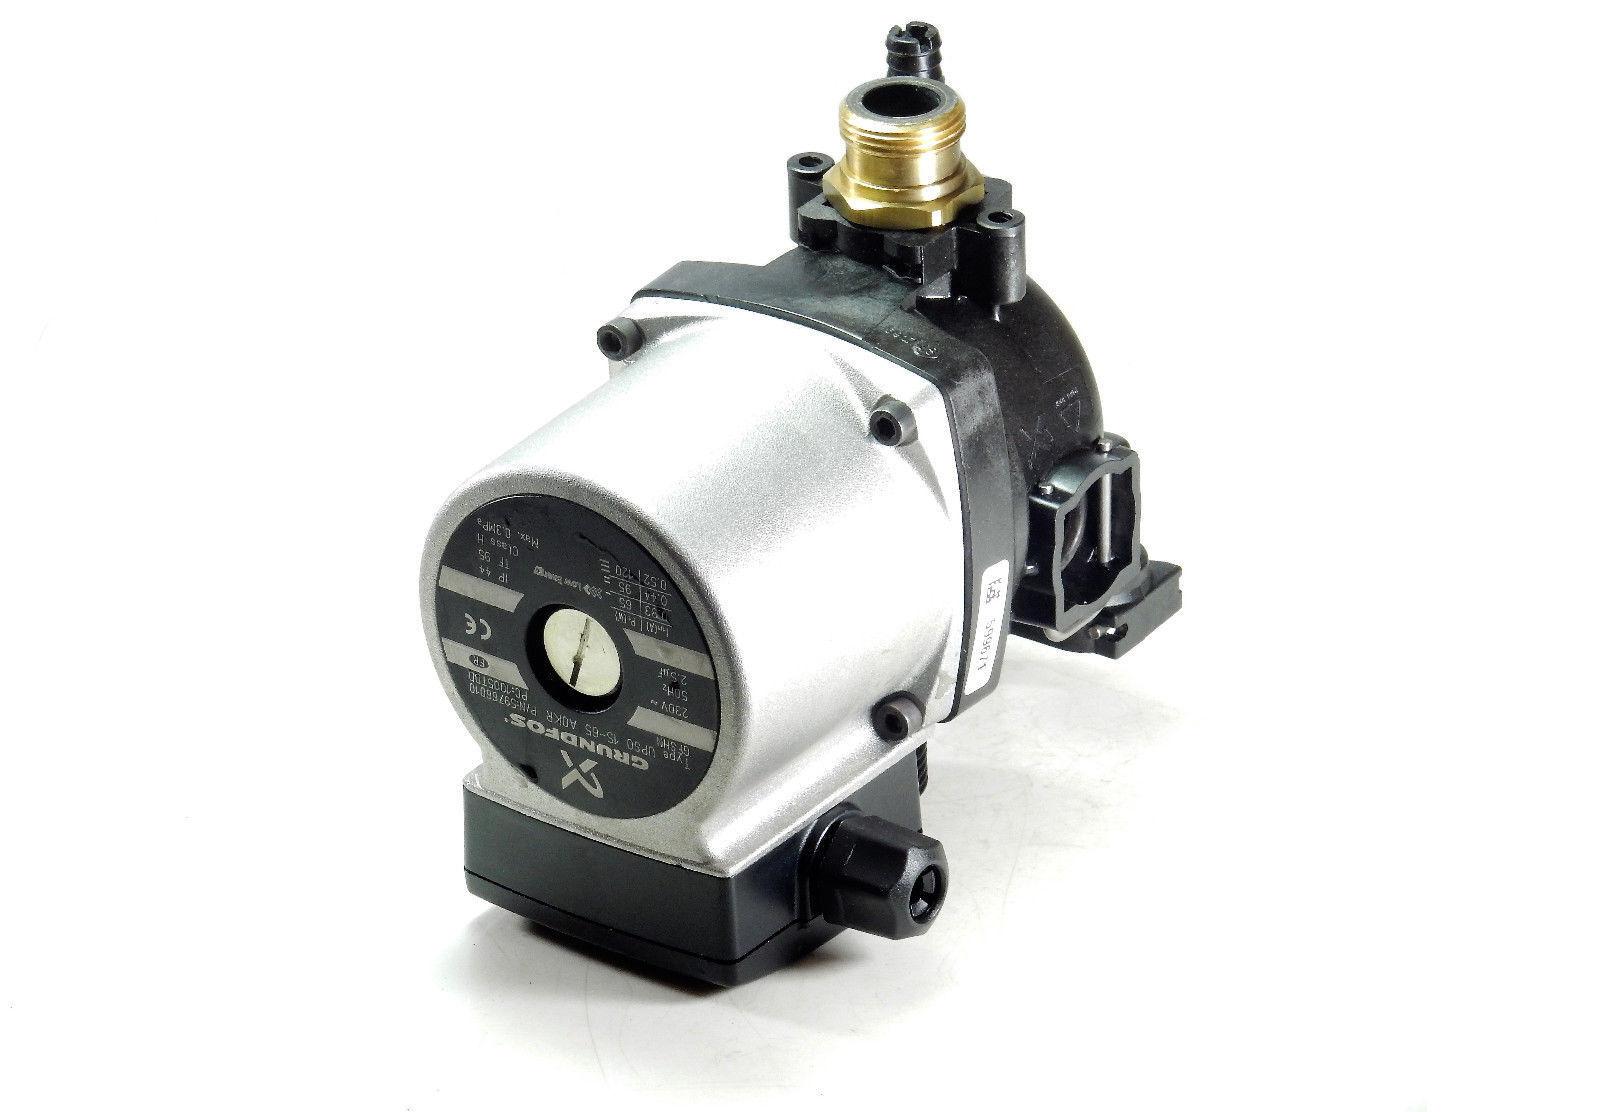 Heatline Capriz 25 28 32 & Kompakt C24 C28 S24 S30 Pumpe 3003201336